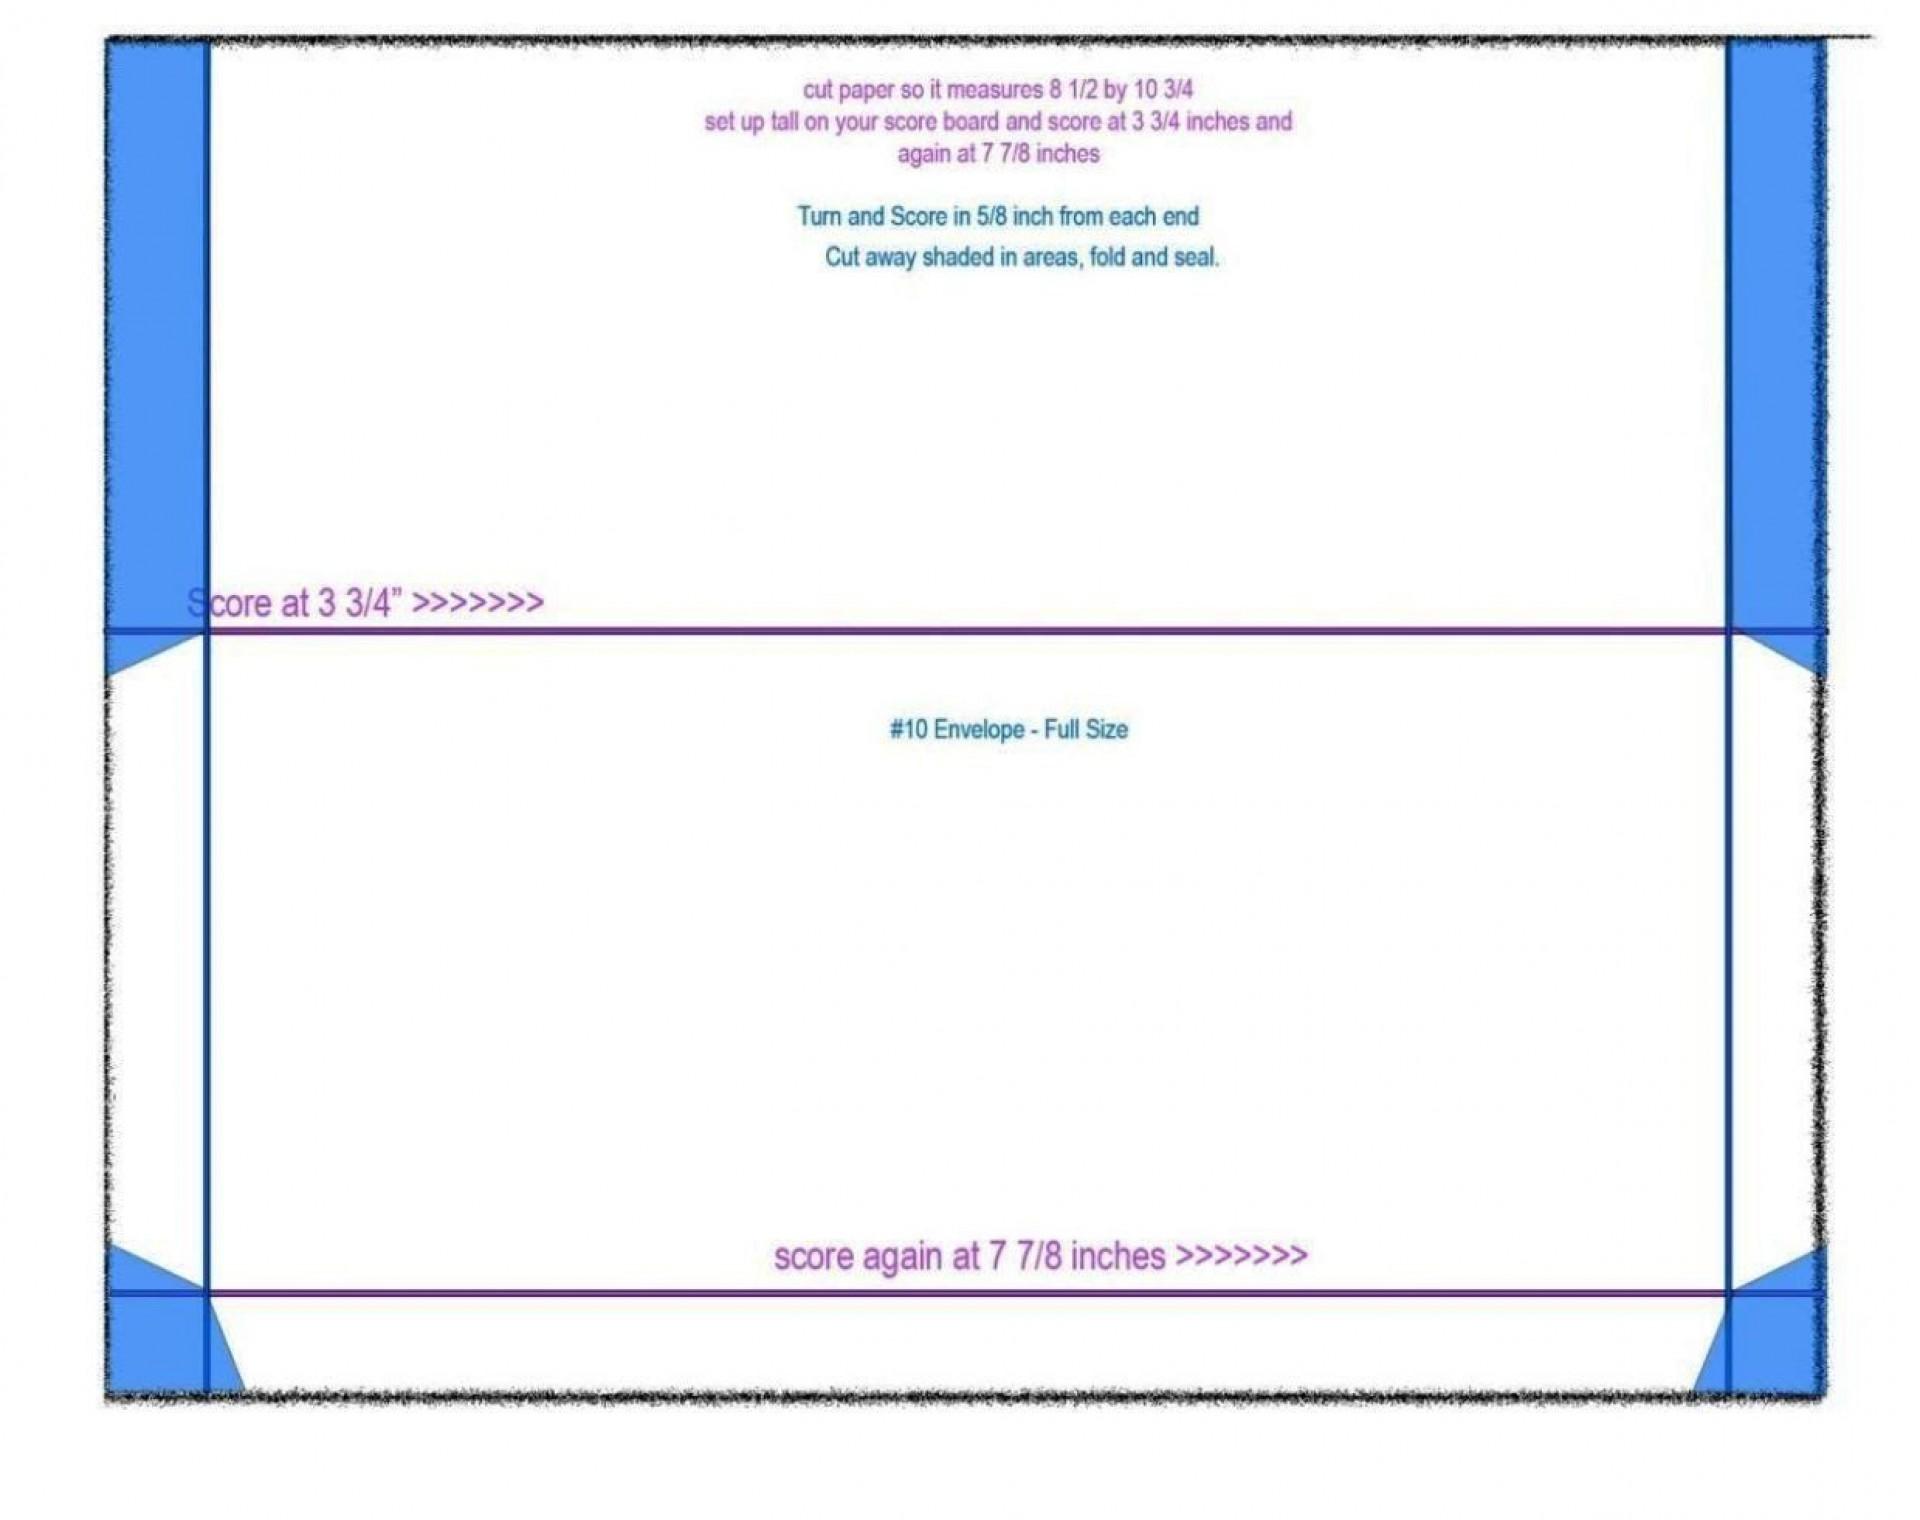 001 Singular 10 Envelope Template Word Concept  Size Microsoft #10 Double Window1920